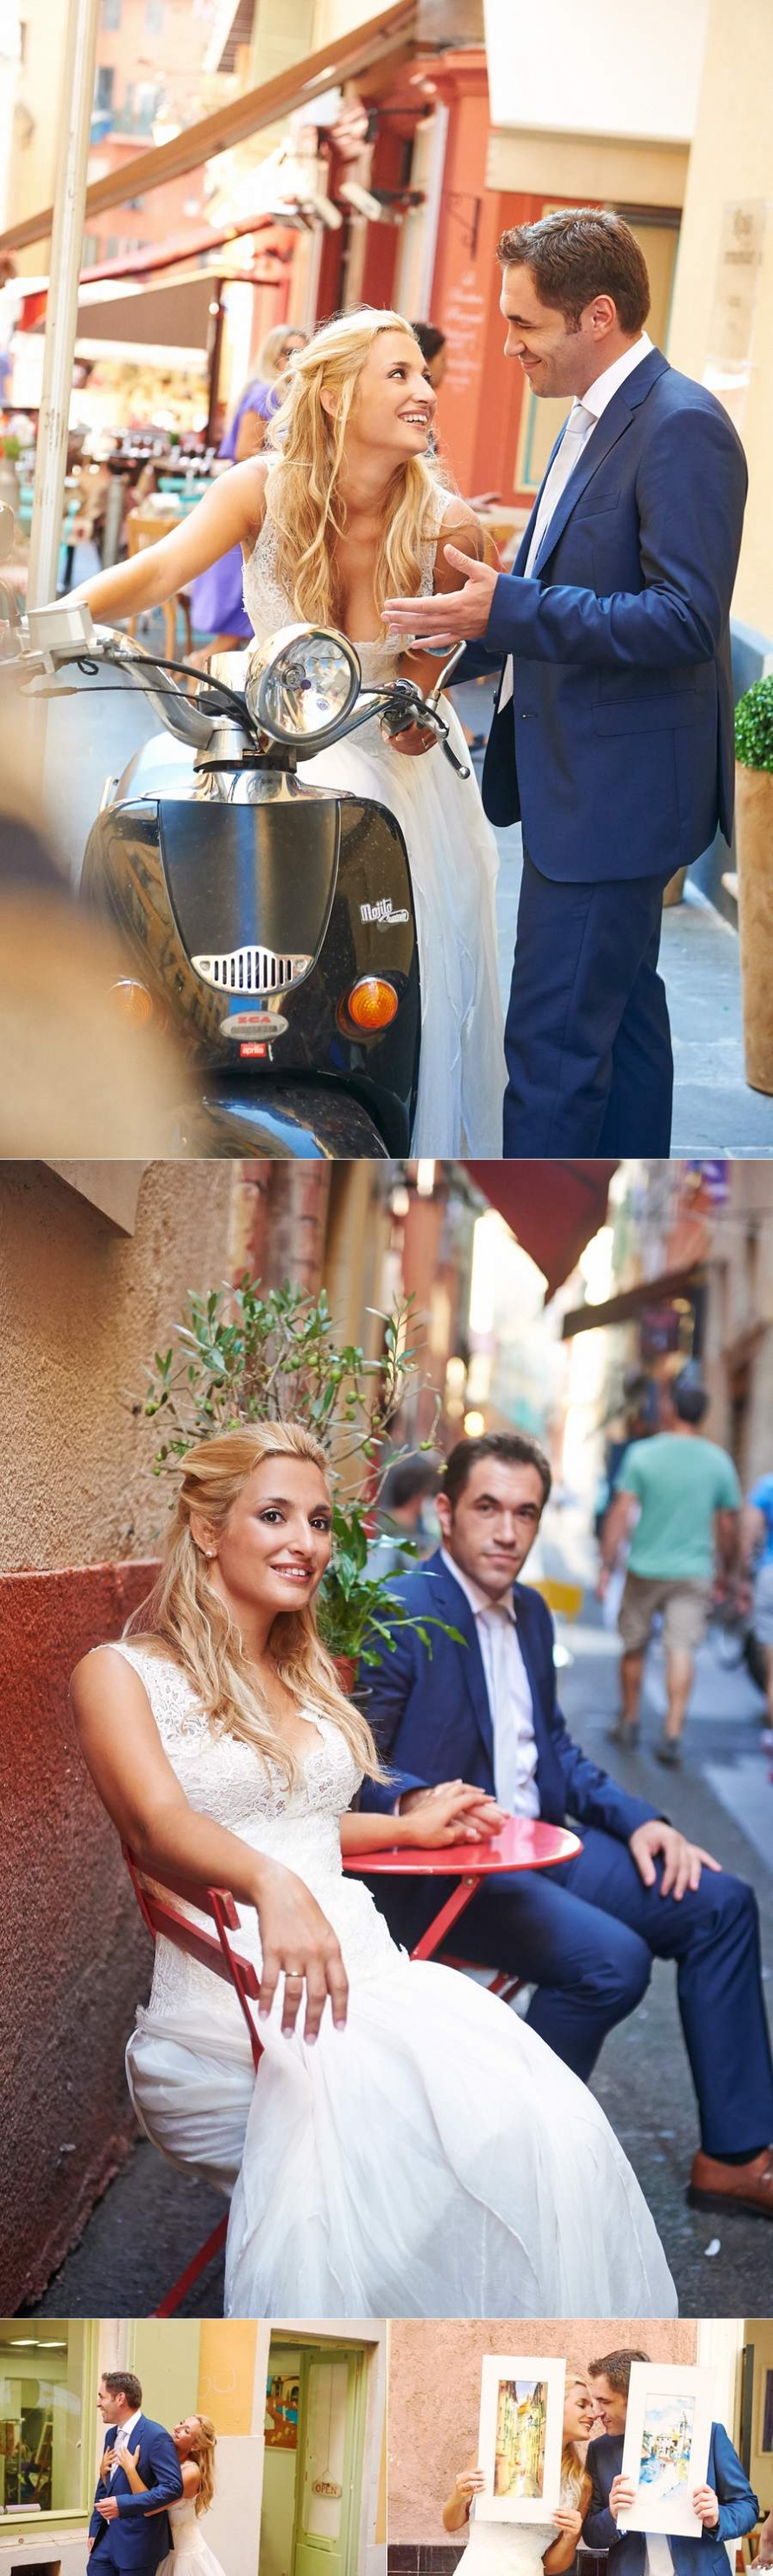 Stavros Efi wedding photos07